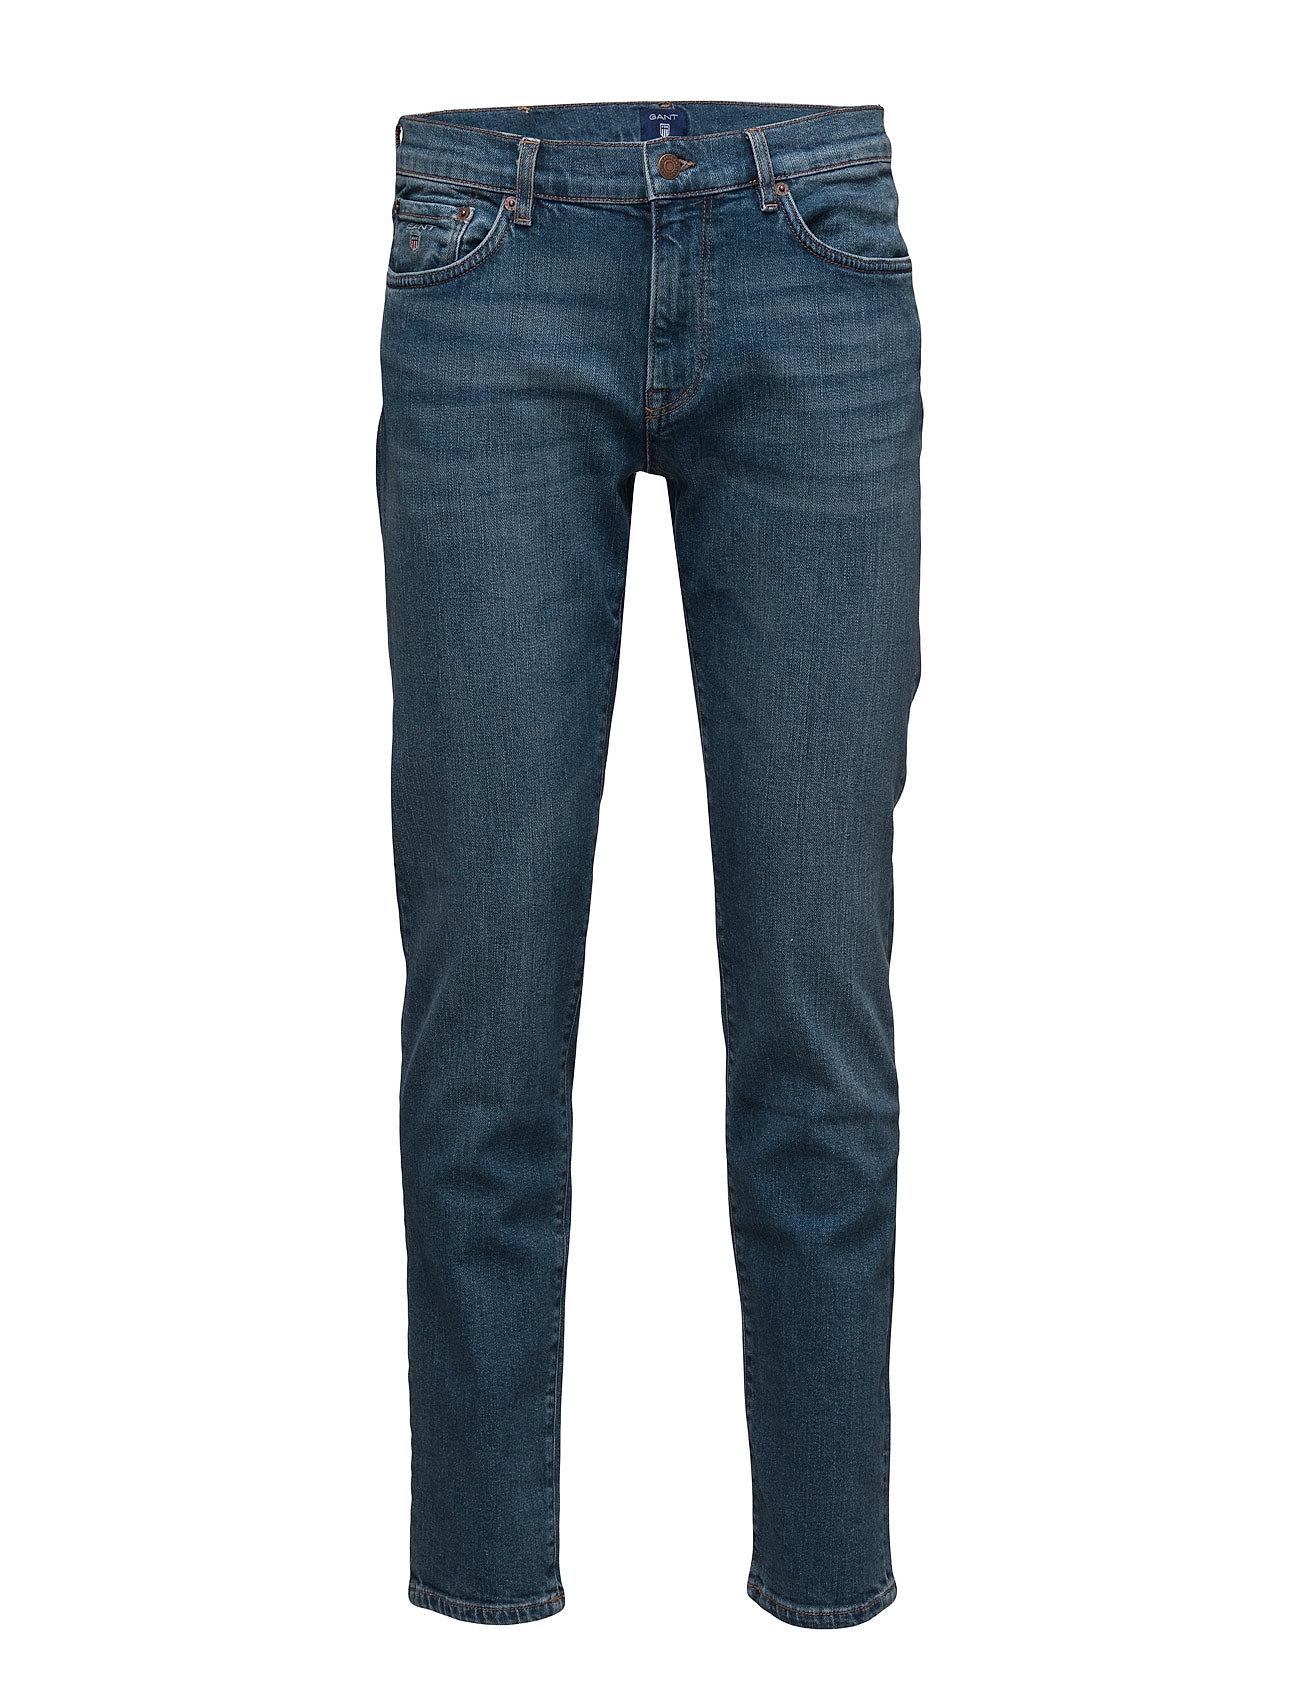 In Worn Slim Gant Jeansmid Blue 8Nn0wyvmO